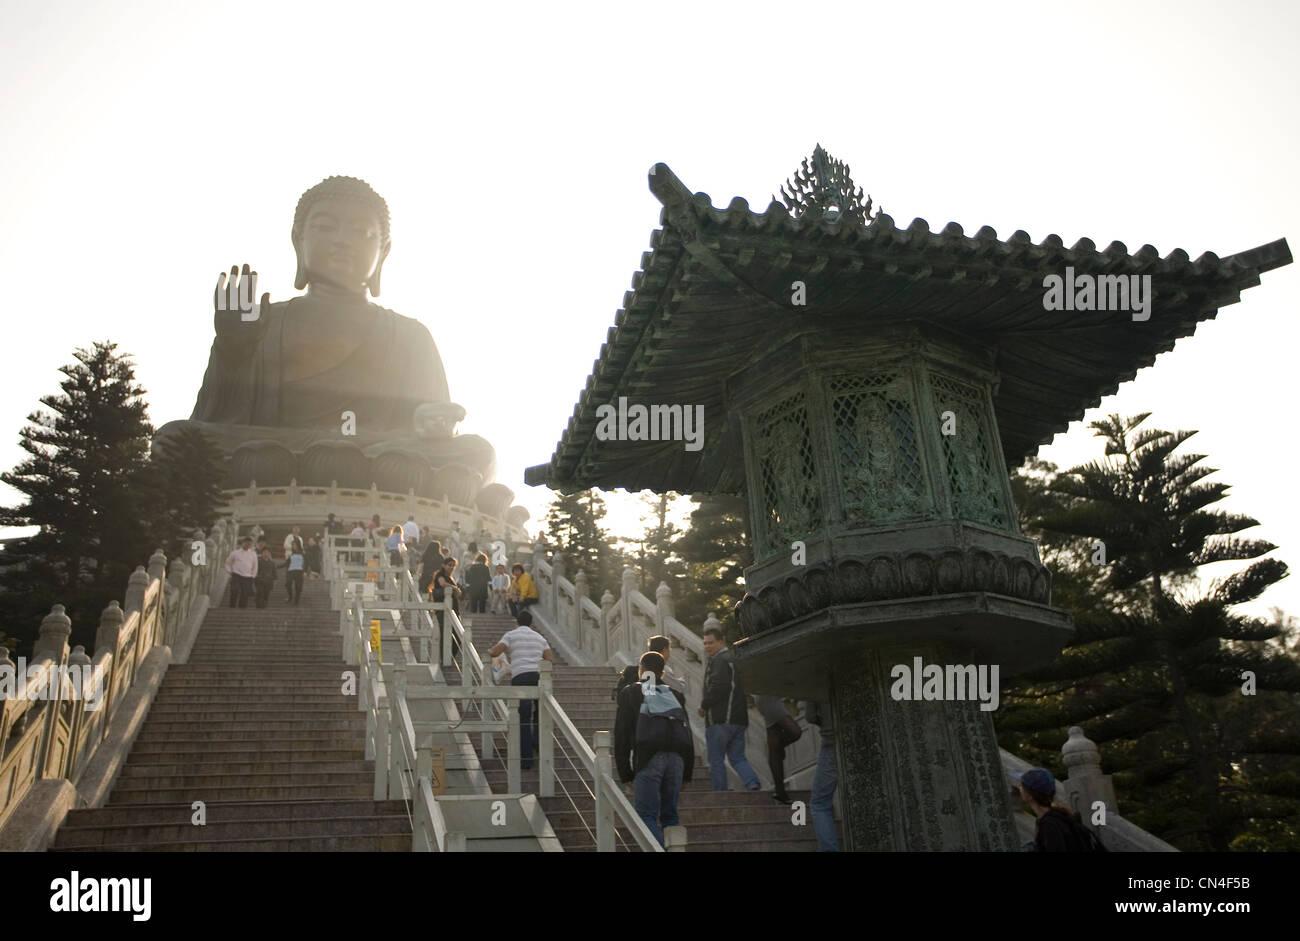 The Big Buddha of Lantau island - Stock Image